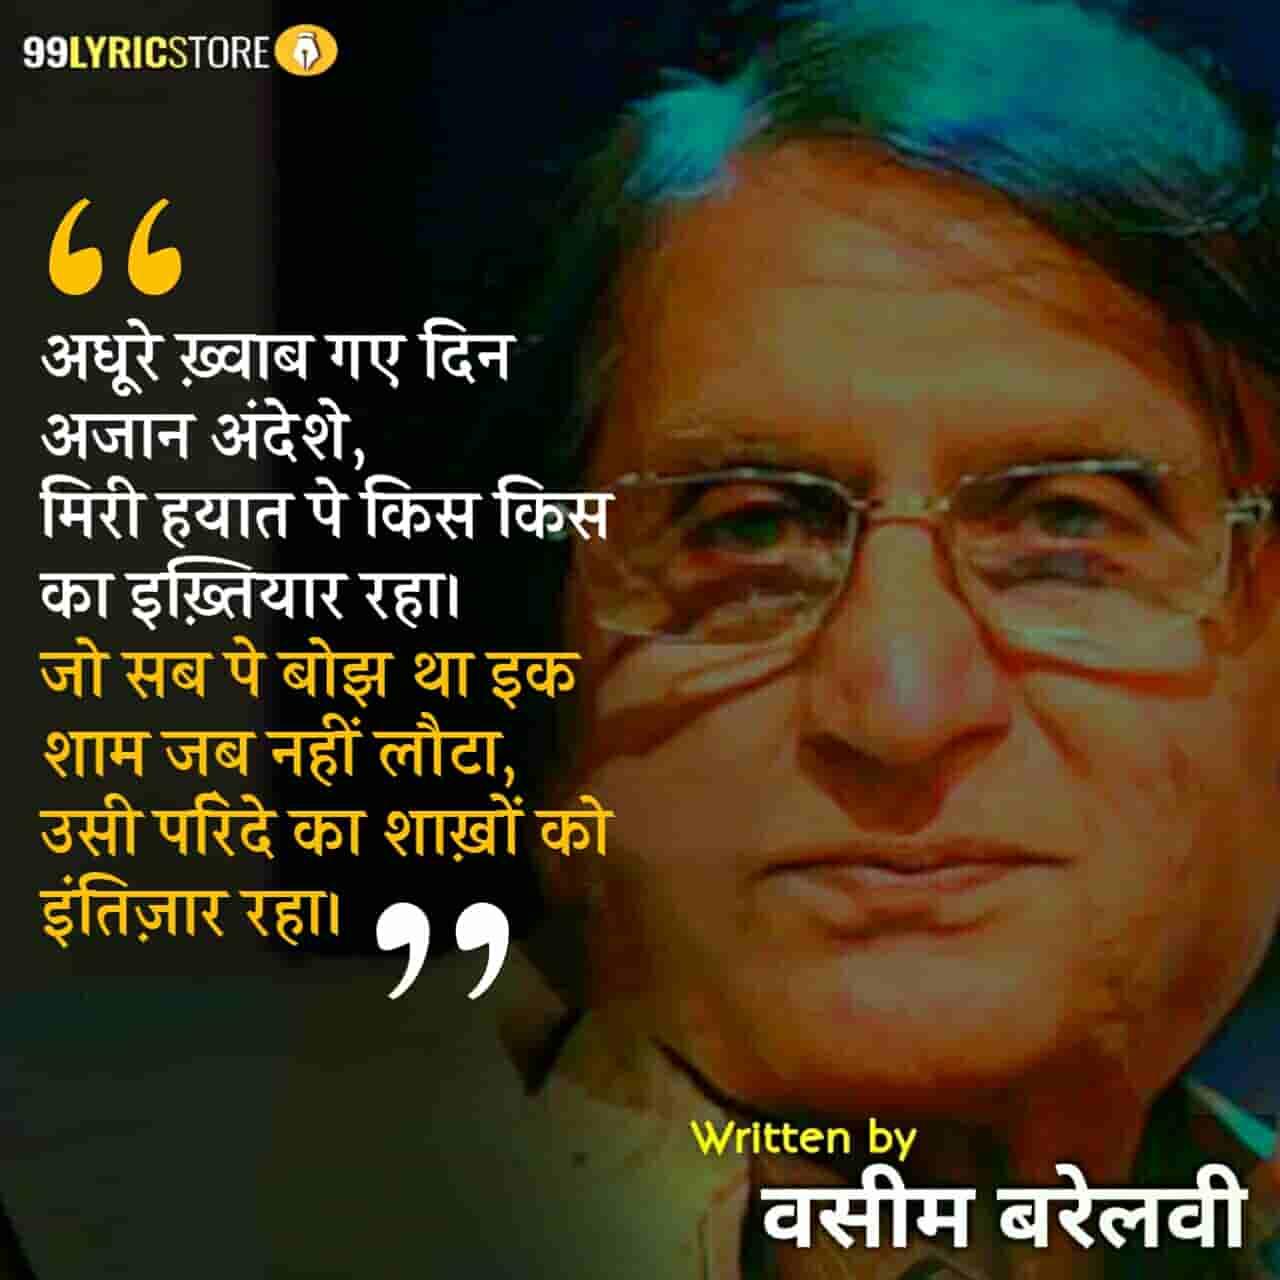 This beautiful ghazal 'Khushi Ka Saath Mila Bhi To Dil Pe Baar Raha' has written by Waseem Barelvi.